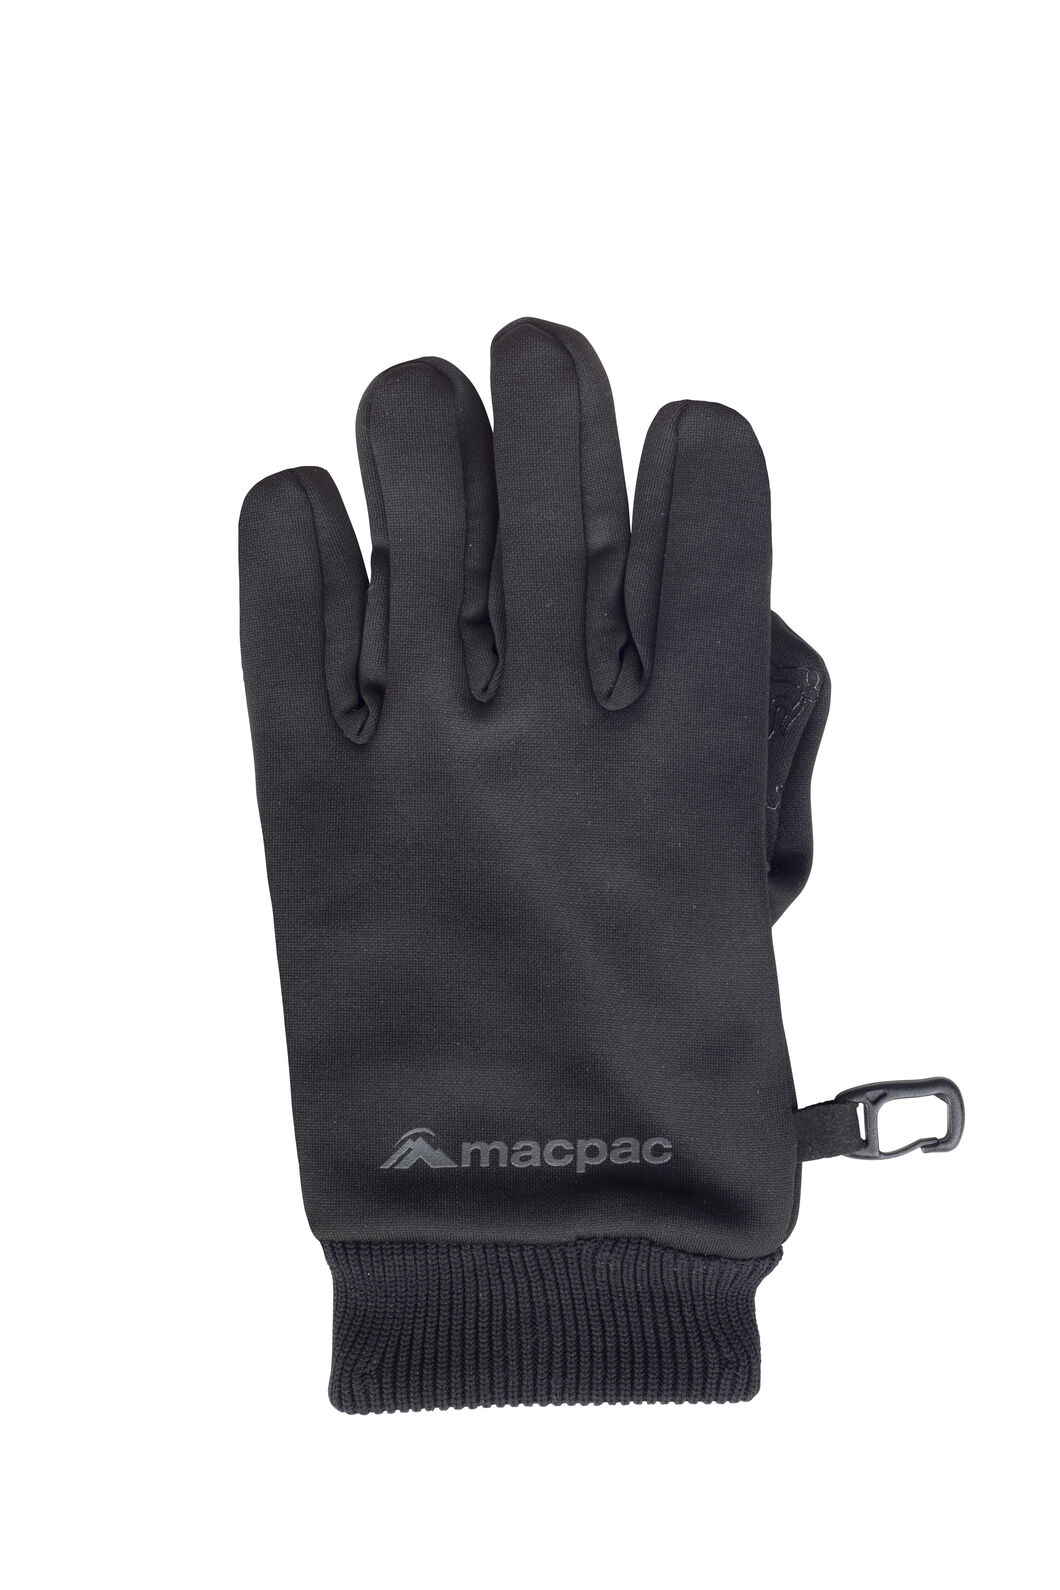 Macpac Fleece Gloves — Kids', Black, hi-res